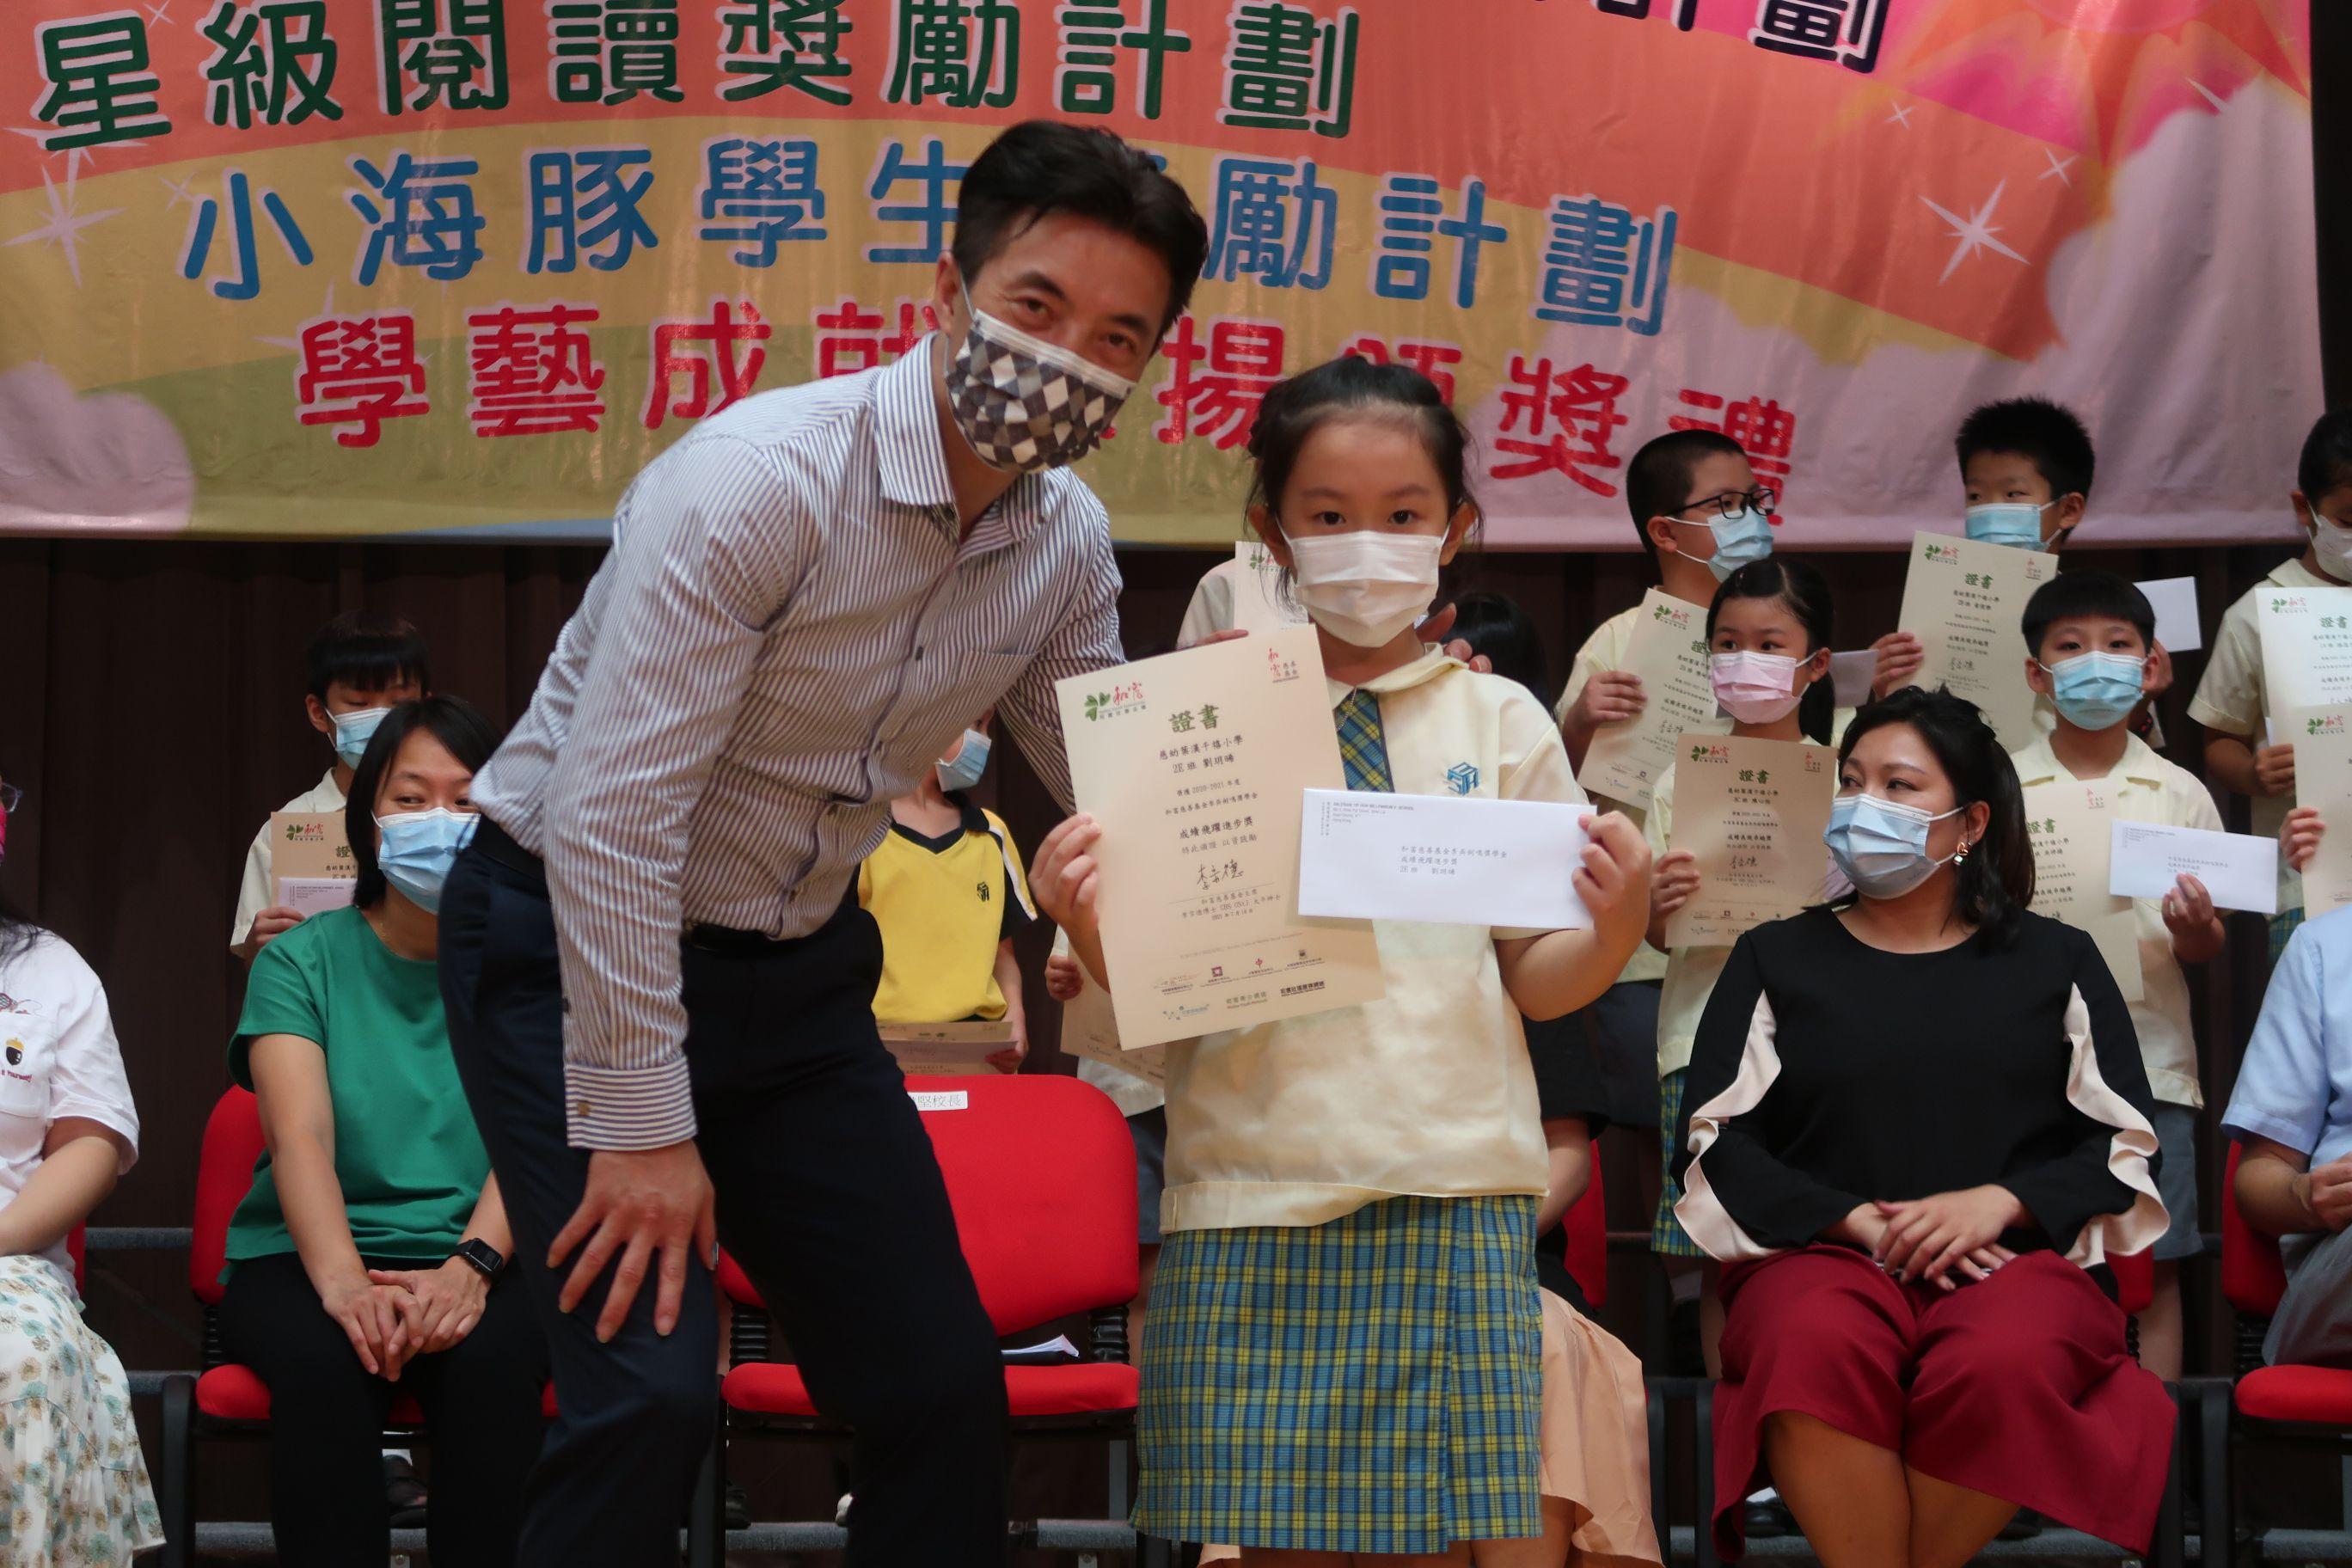 https://syh.edu.hk/sites/default/files/img_5943.jpg